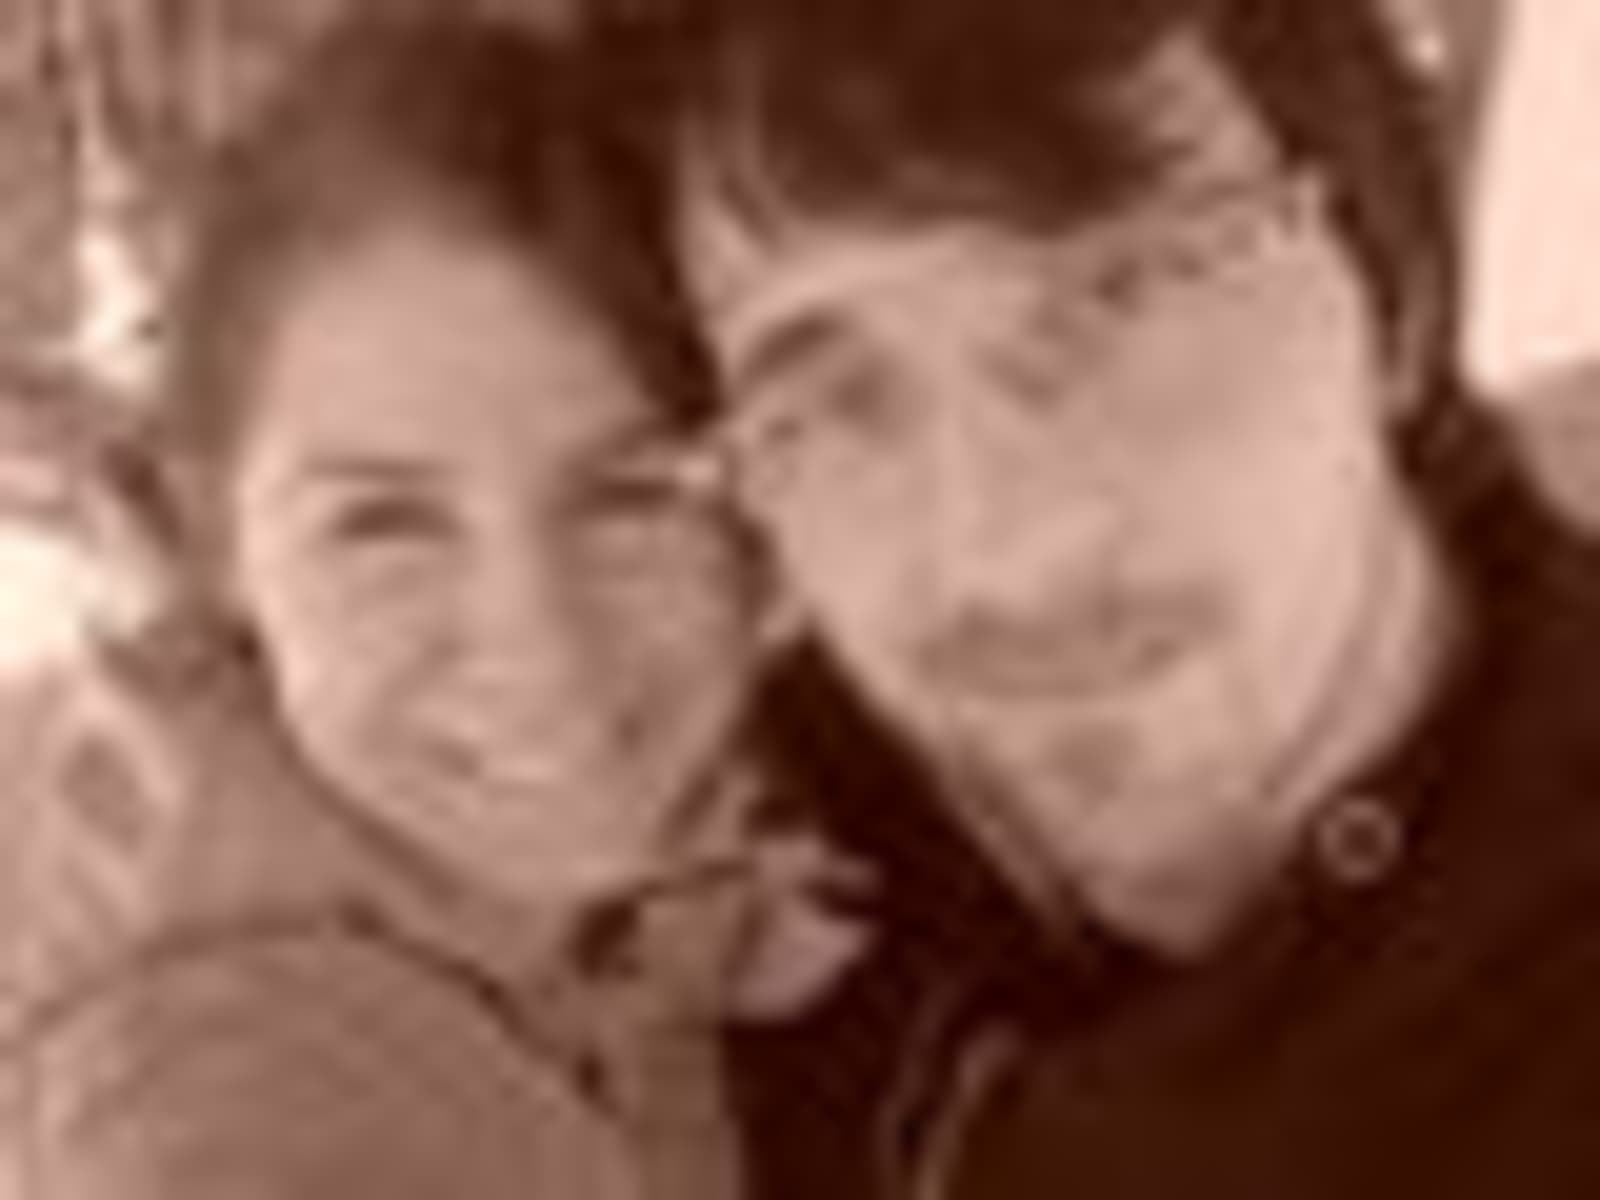 Kristin & Frank from Gera, Germany